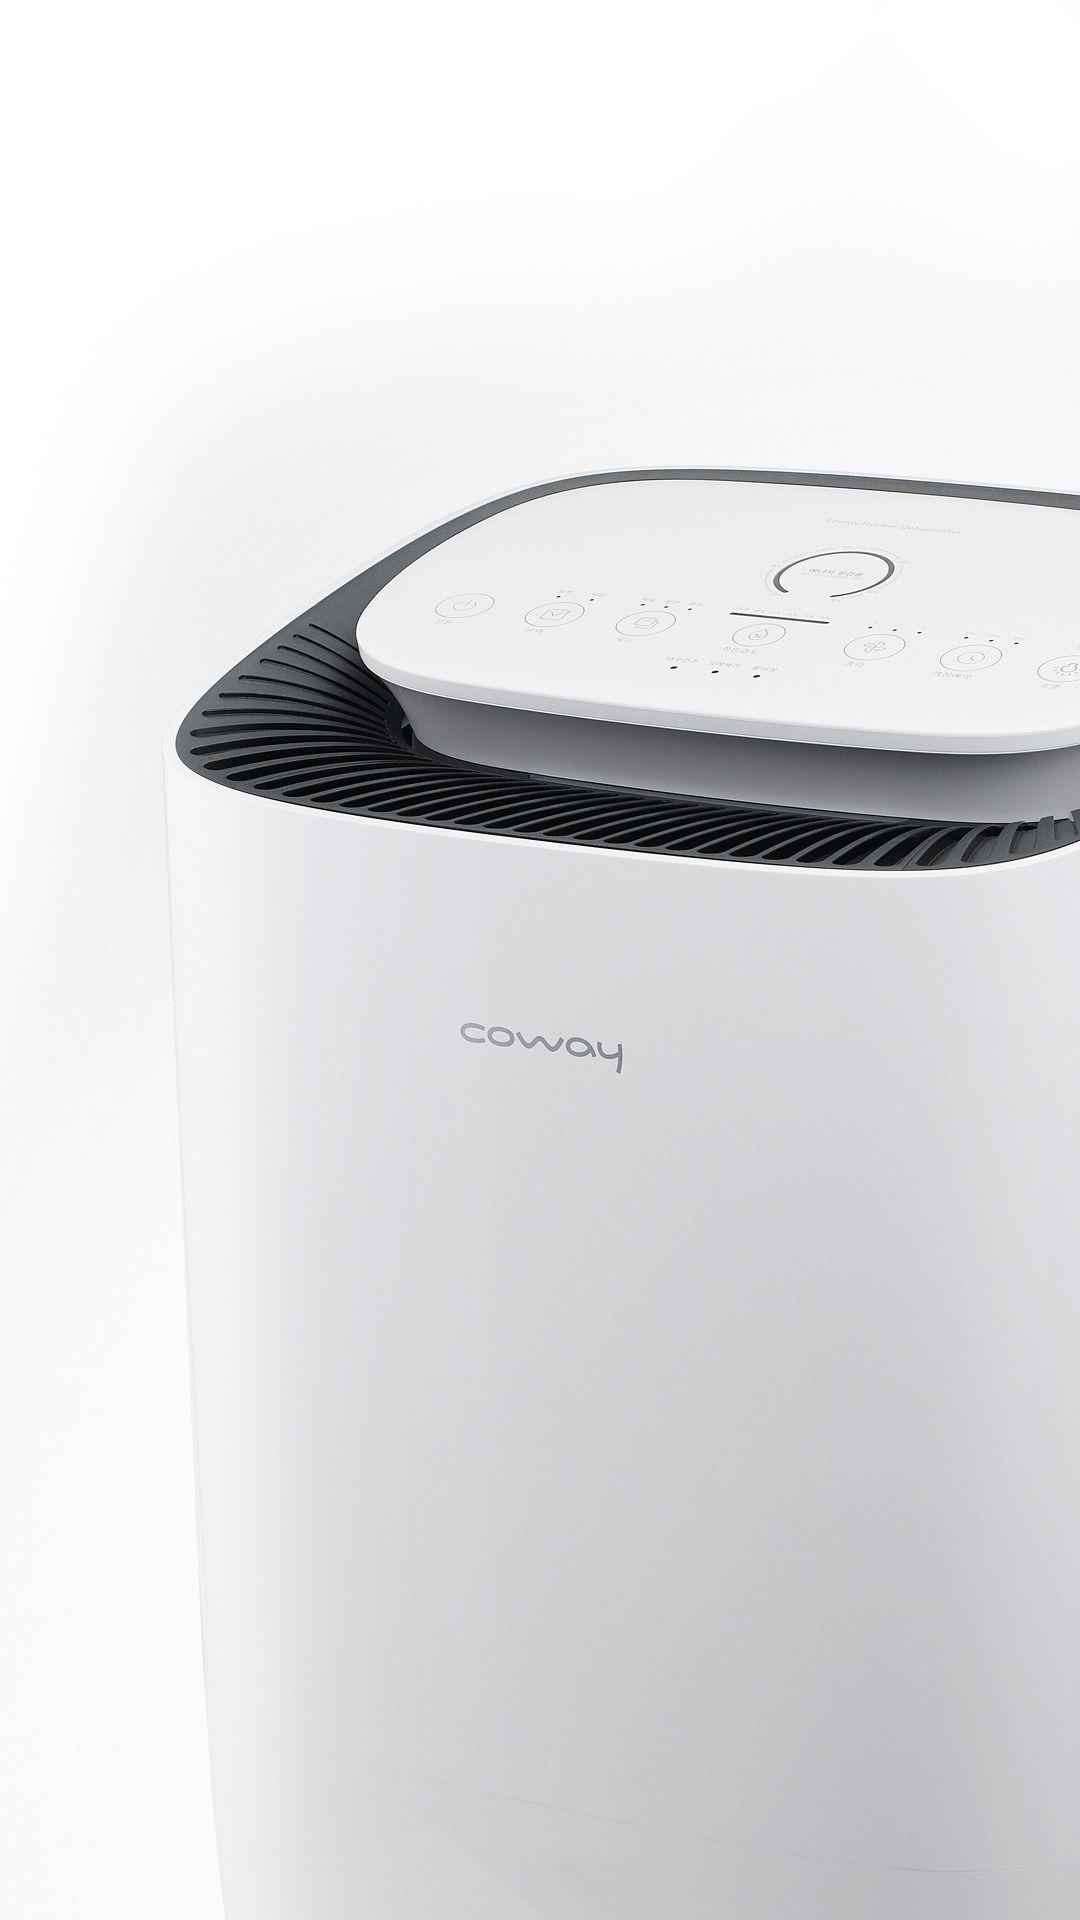 MY EYES OPEN | Huawei | Design, Towel storage, Design trends